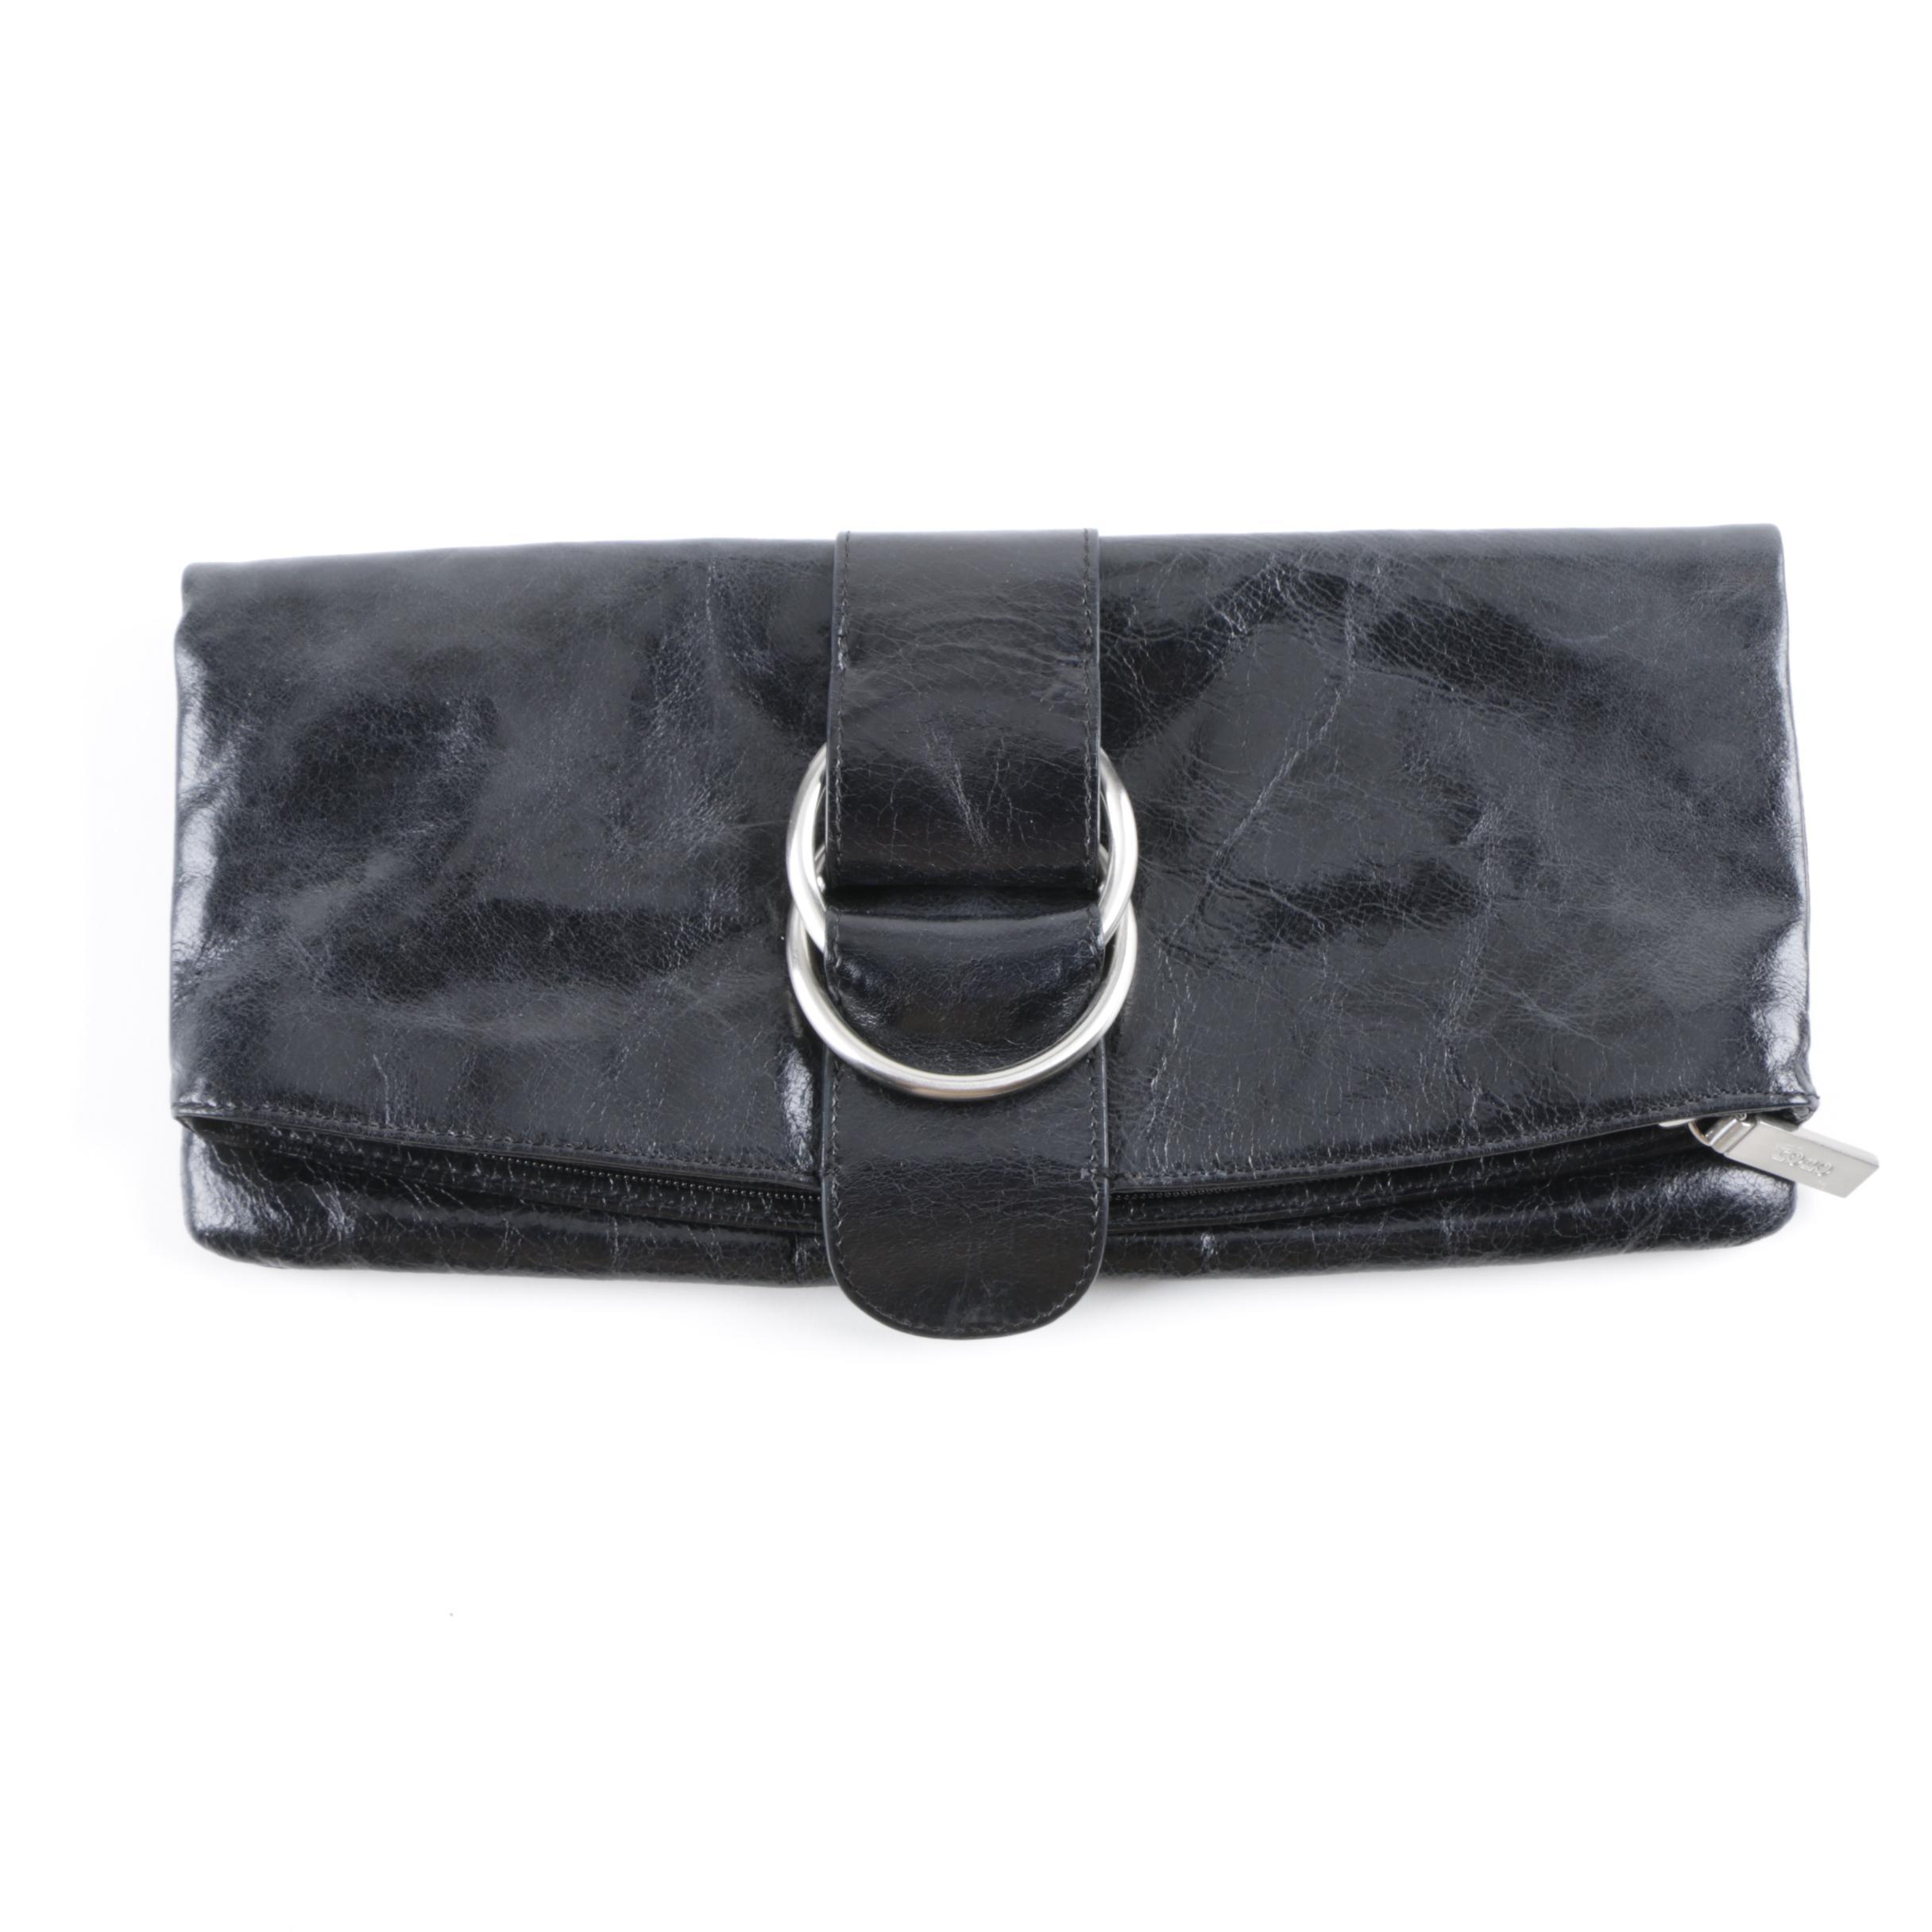 Hobo International Black Leather Wallet